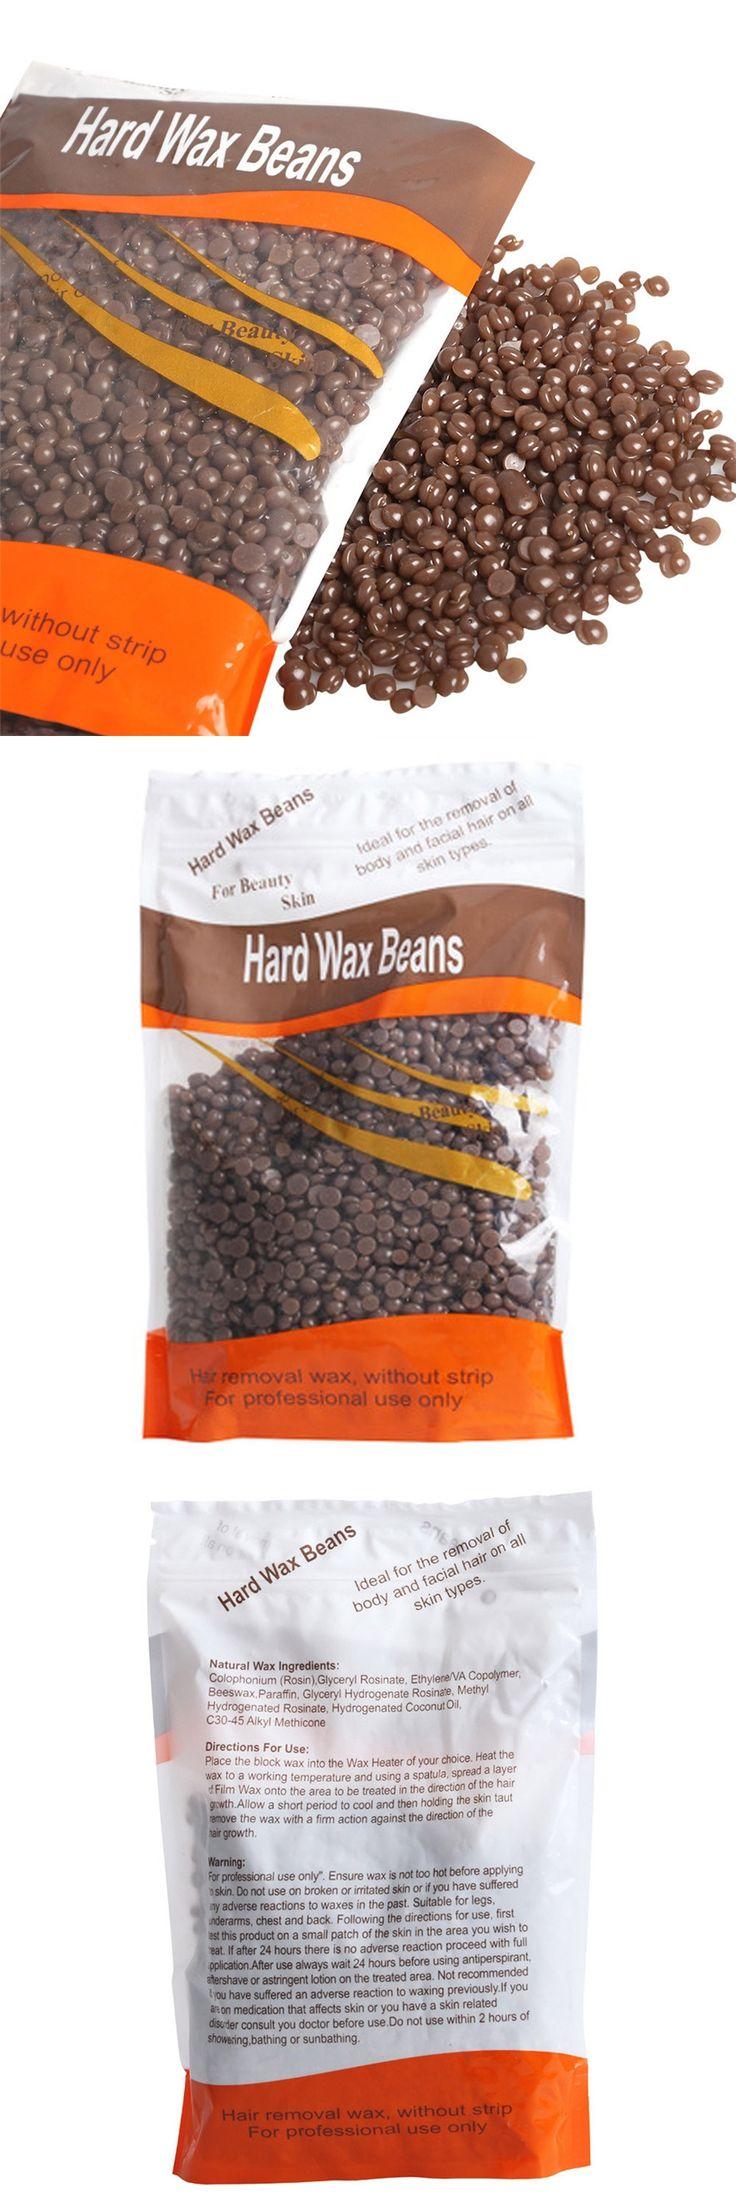 No Strip Depilatory Hot Film Hard Wax Pellet Waxing Bikini Hair Removal Bean best seller#30